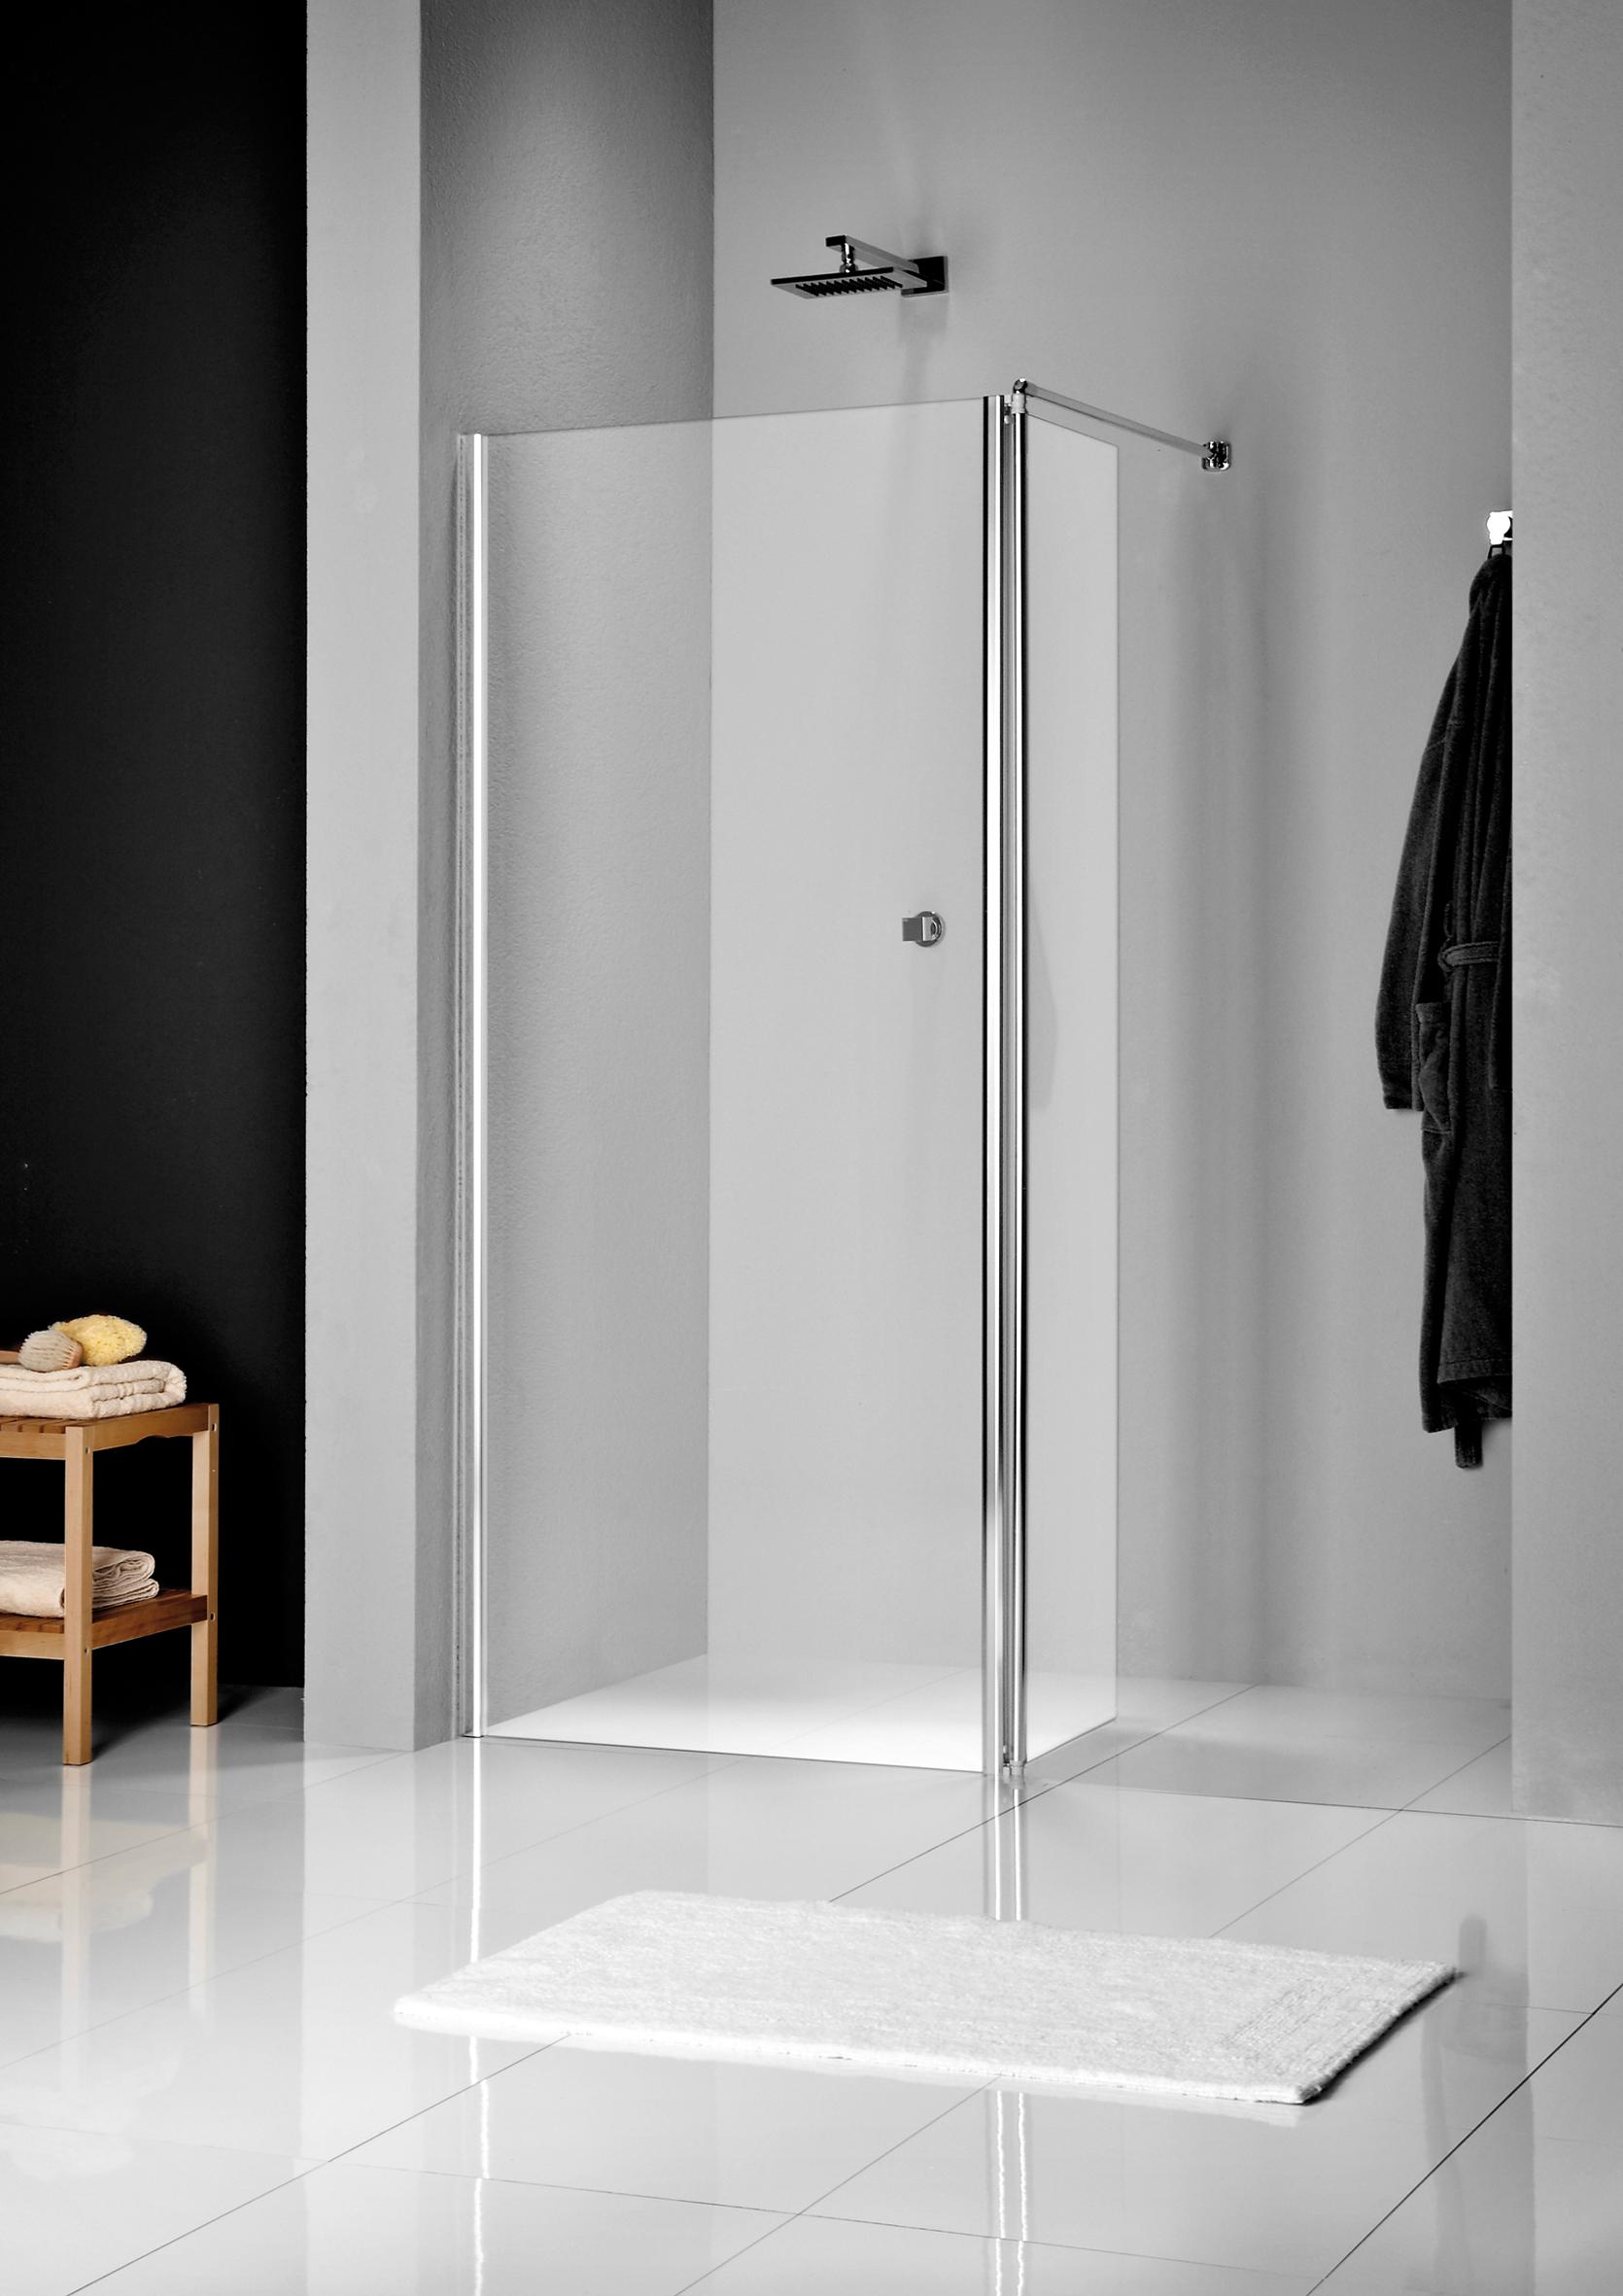 Sealskin Get Wet W205 inloop type a1 130x200cm mat zilver profiel en helder glas